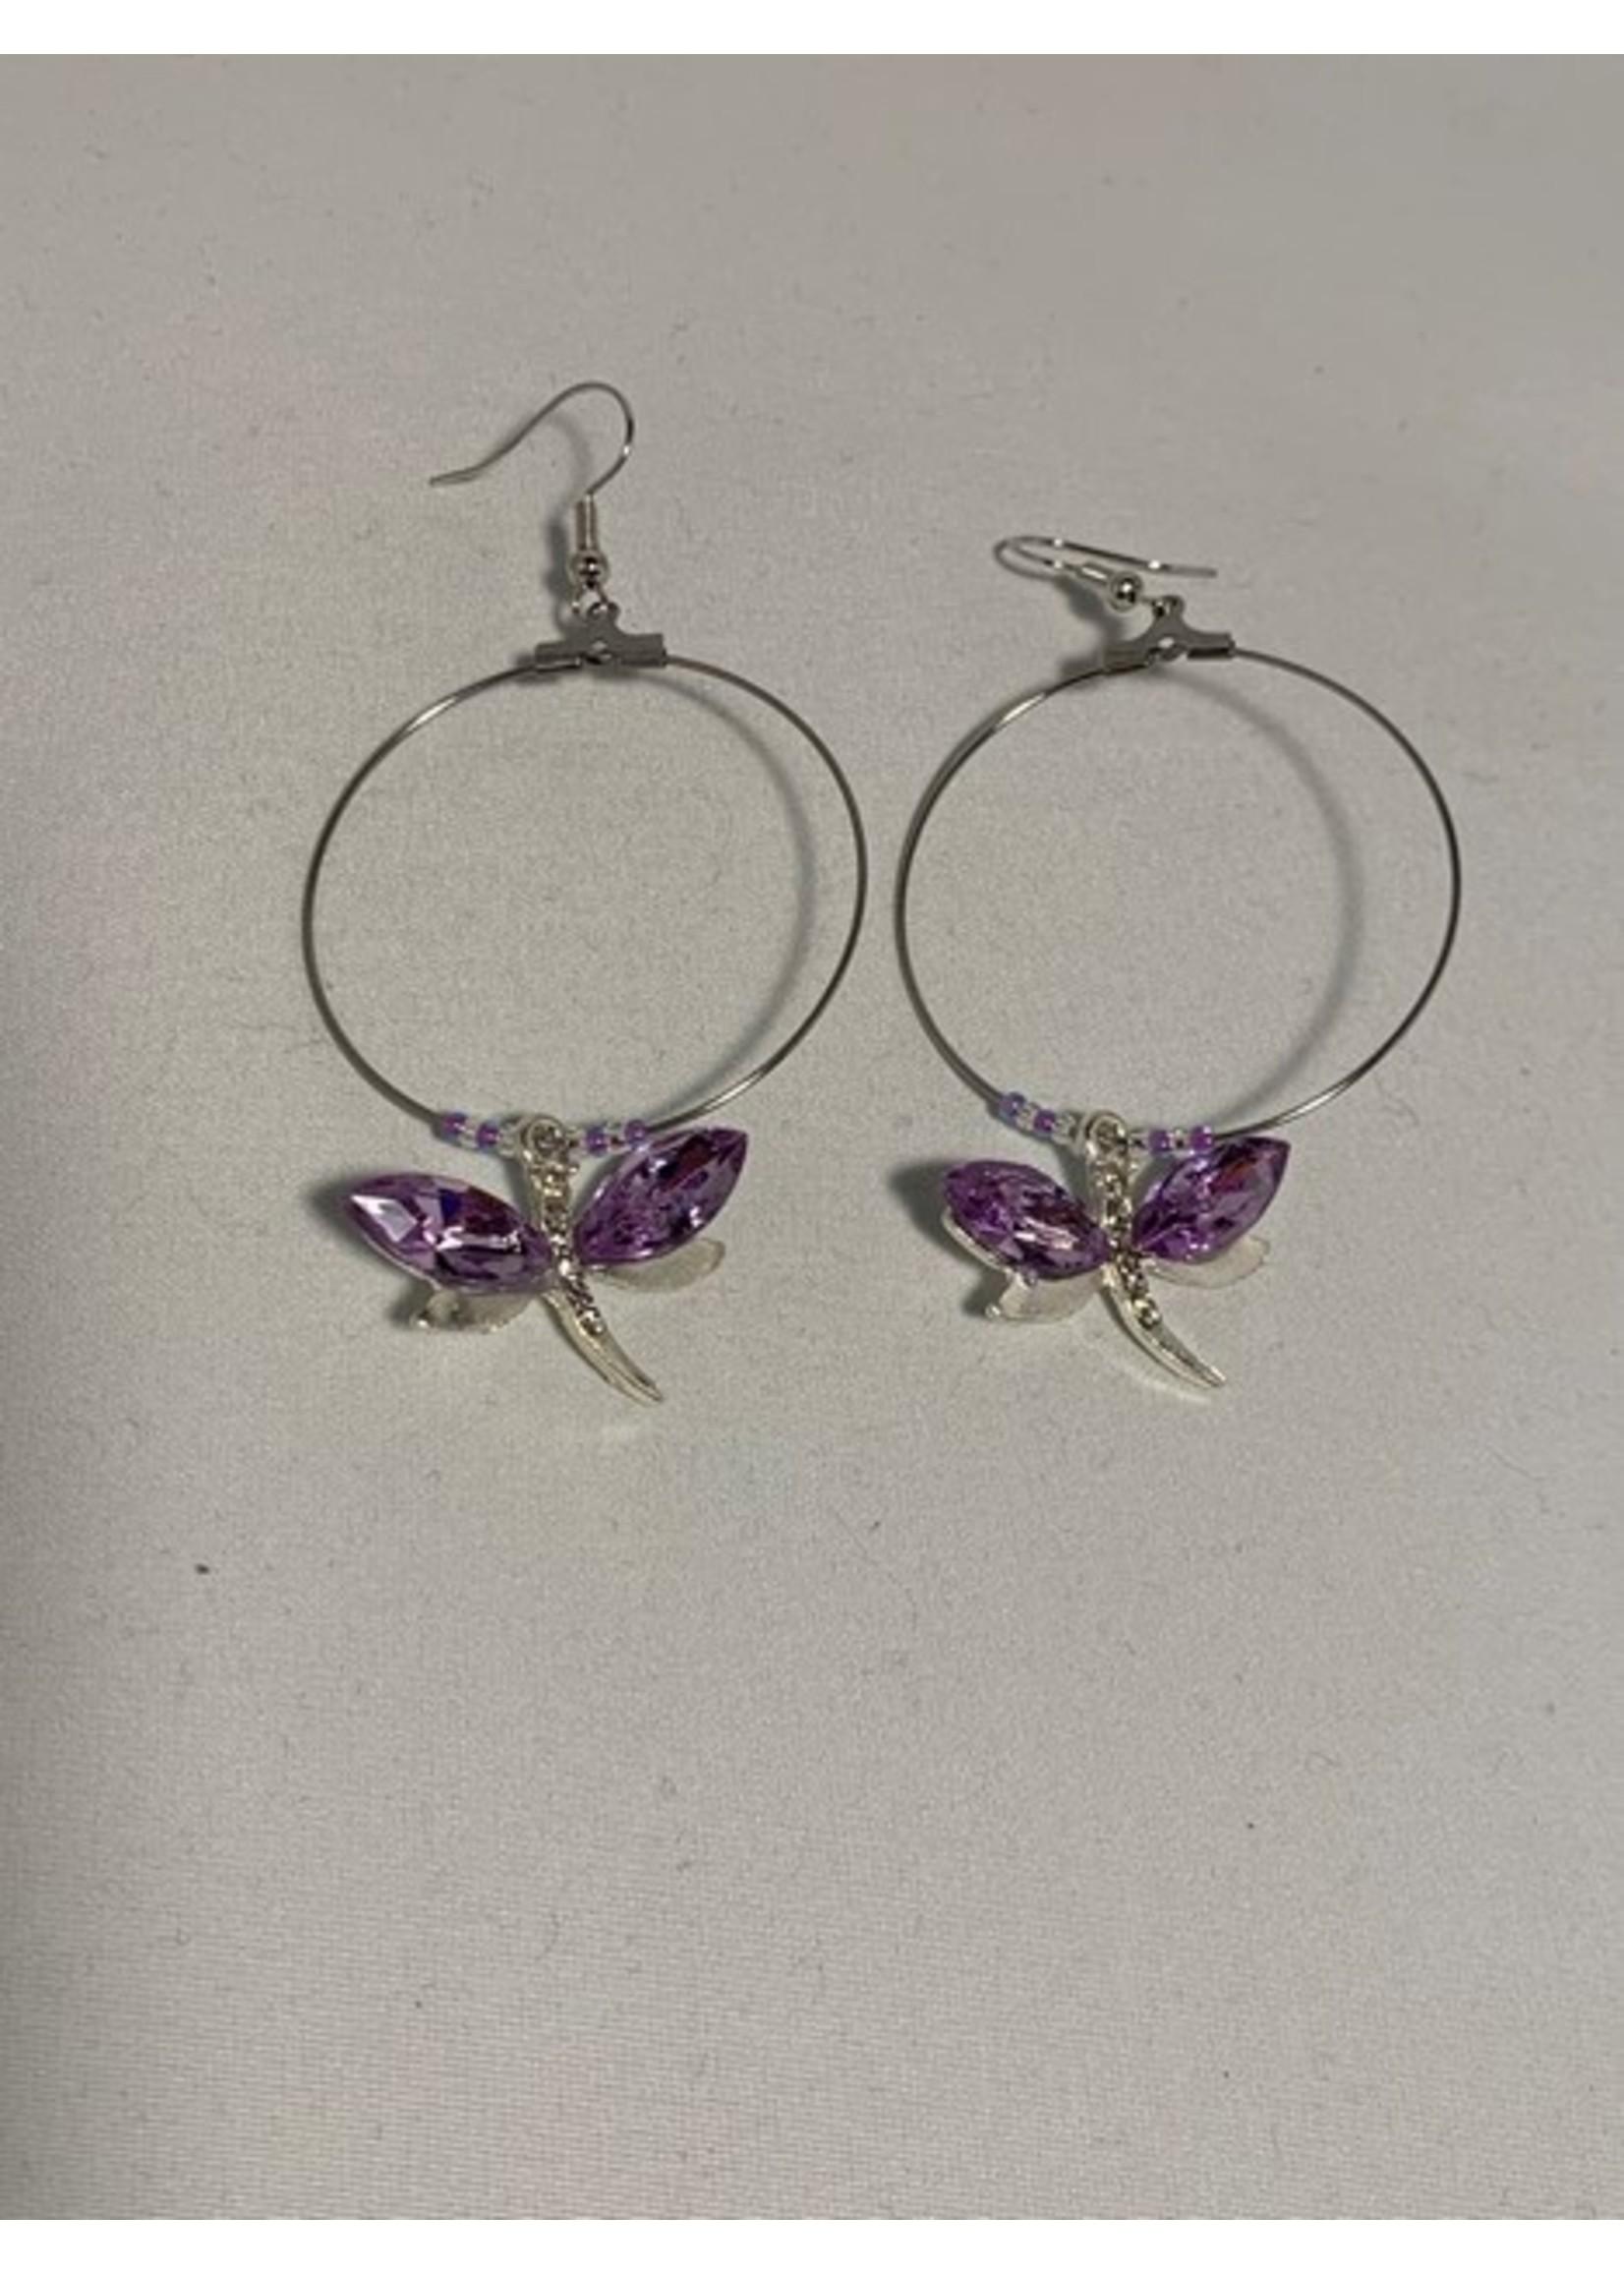 Large Hoop Earrings Light Purple Dragonfly